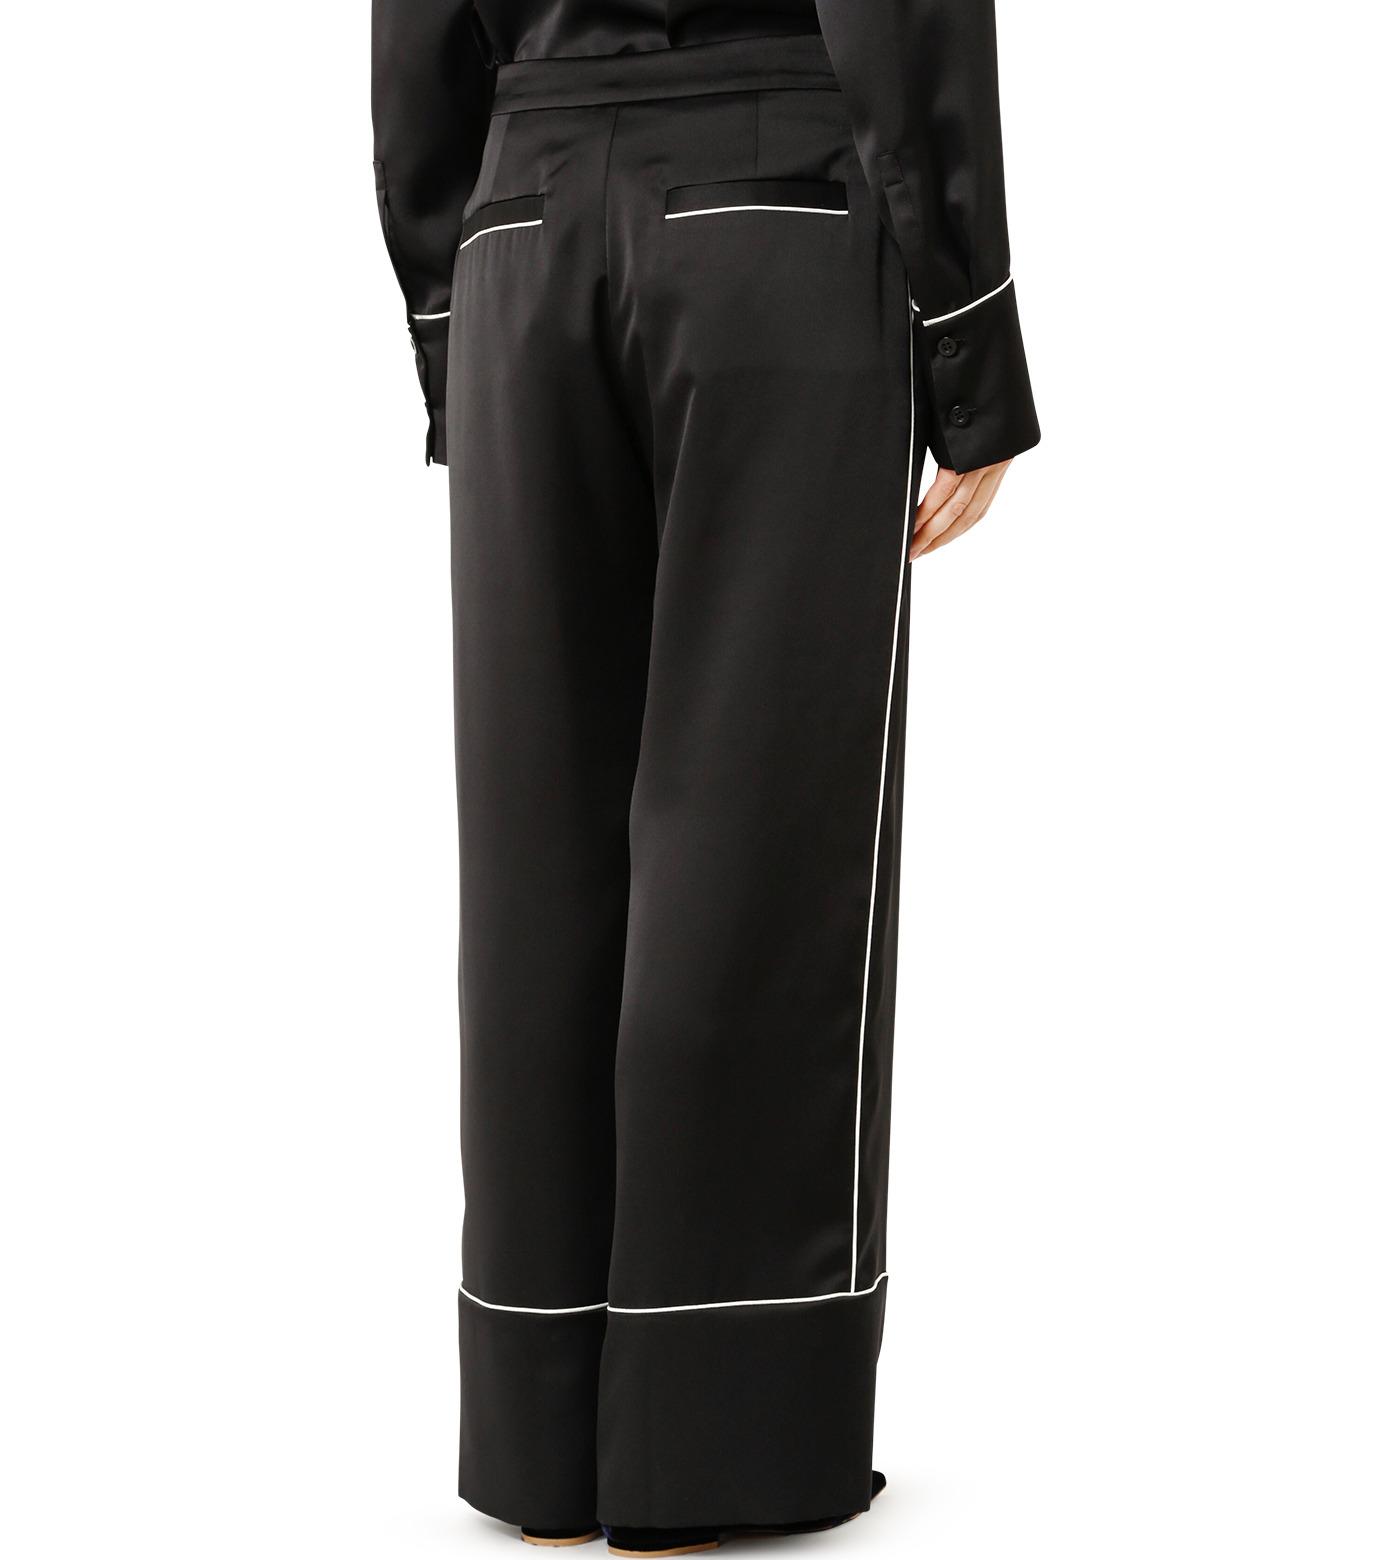 LE CIEL BLEU(ルシェルブルー)のパジャマルックパンツ-BLACK(パンツ/pants)-19S68101 拡大詳細画像4